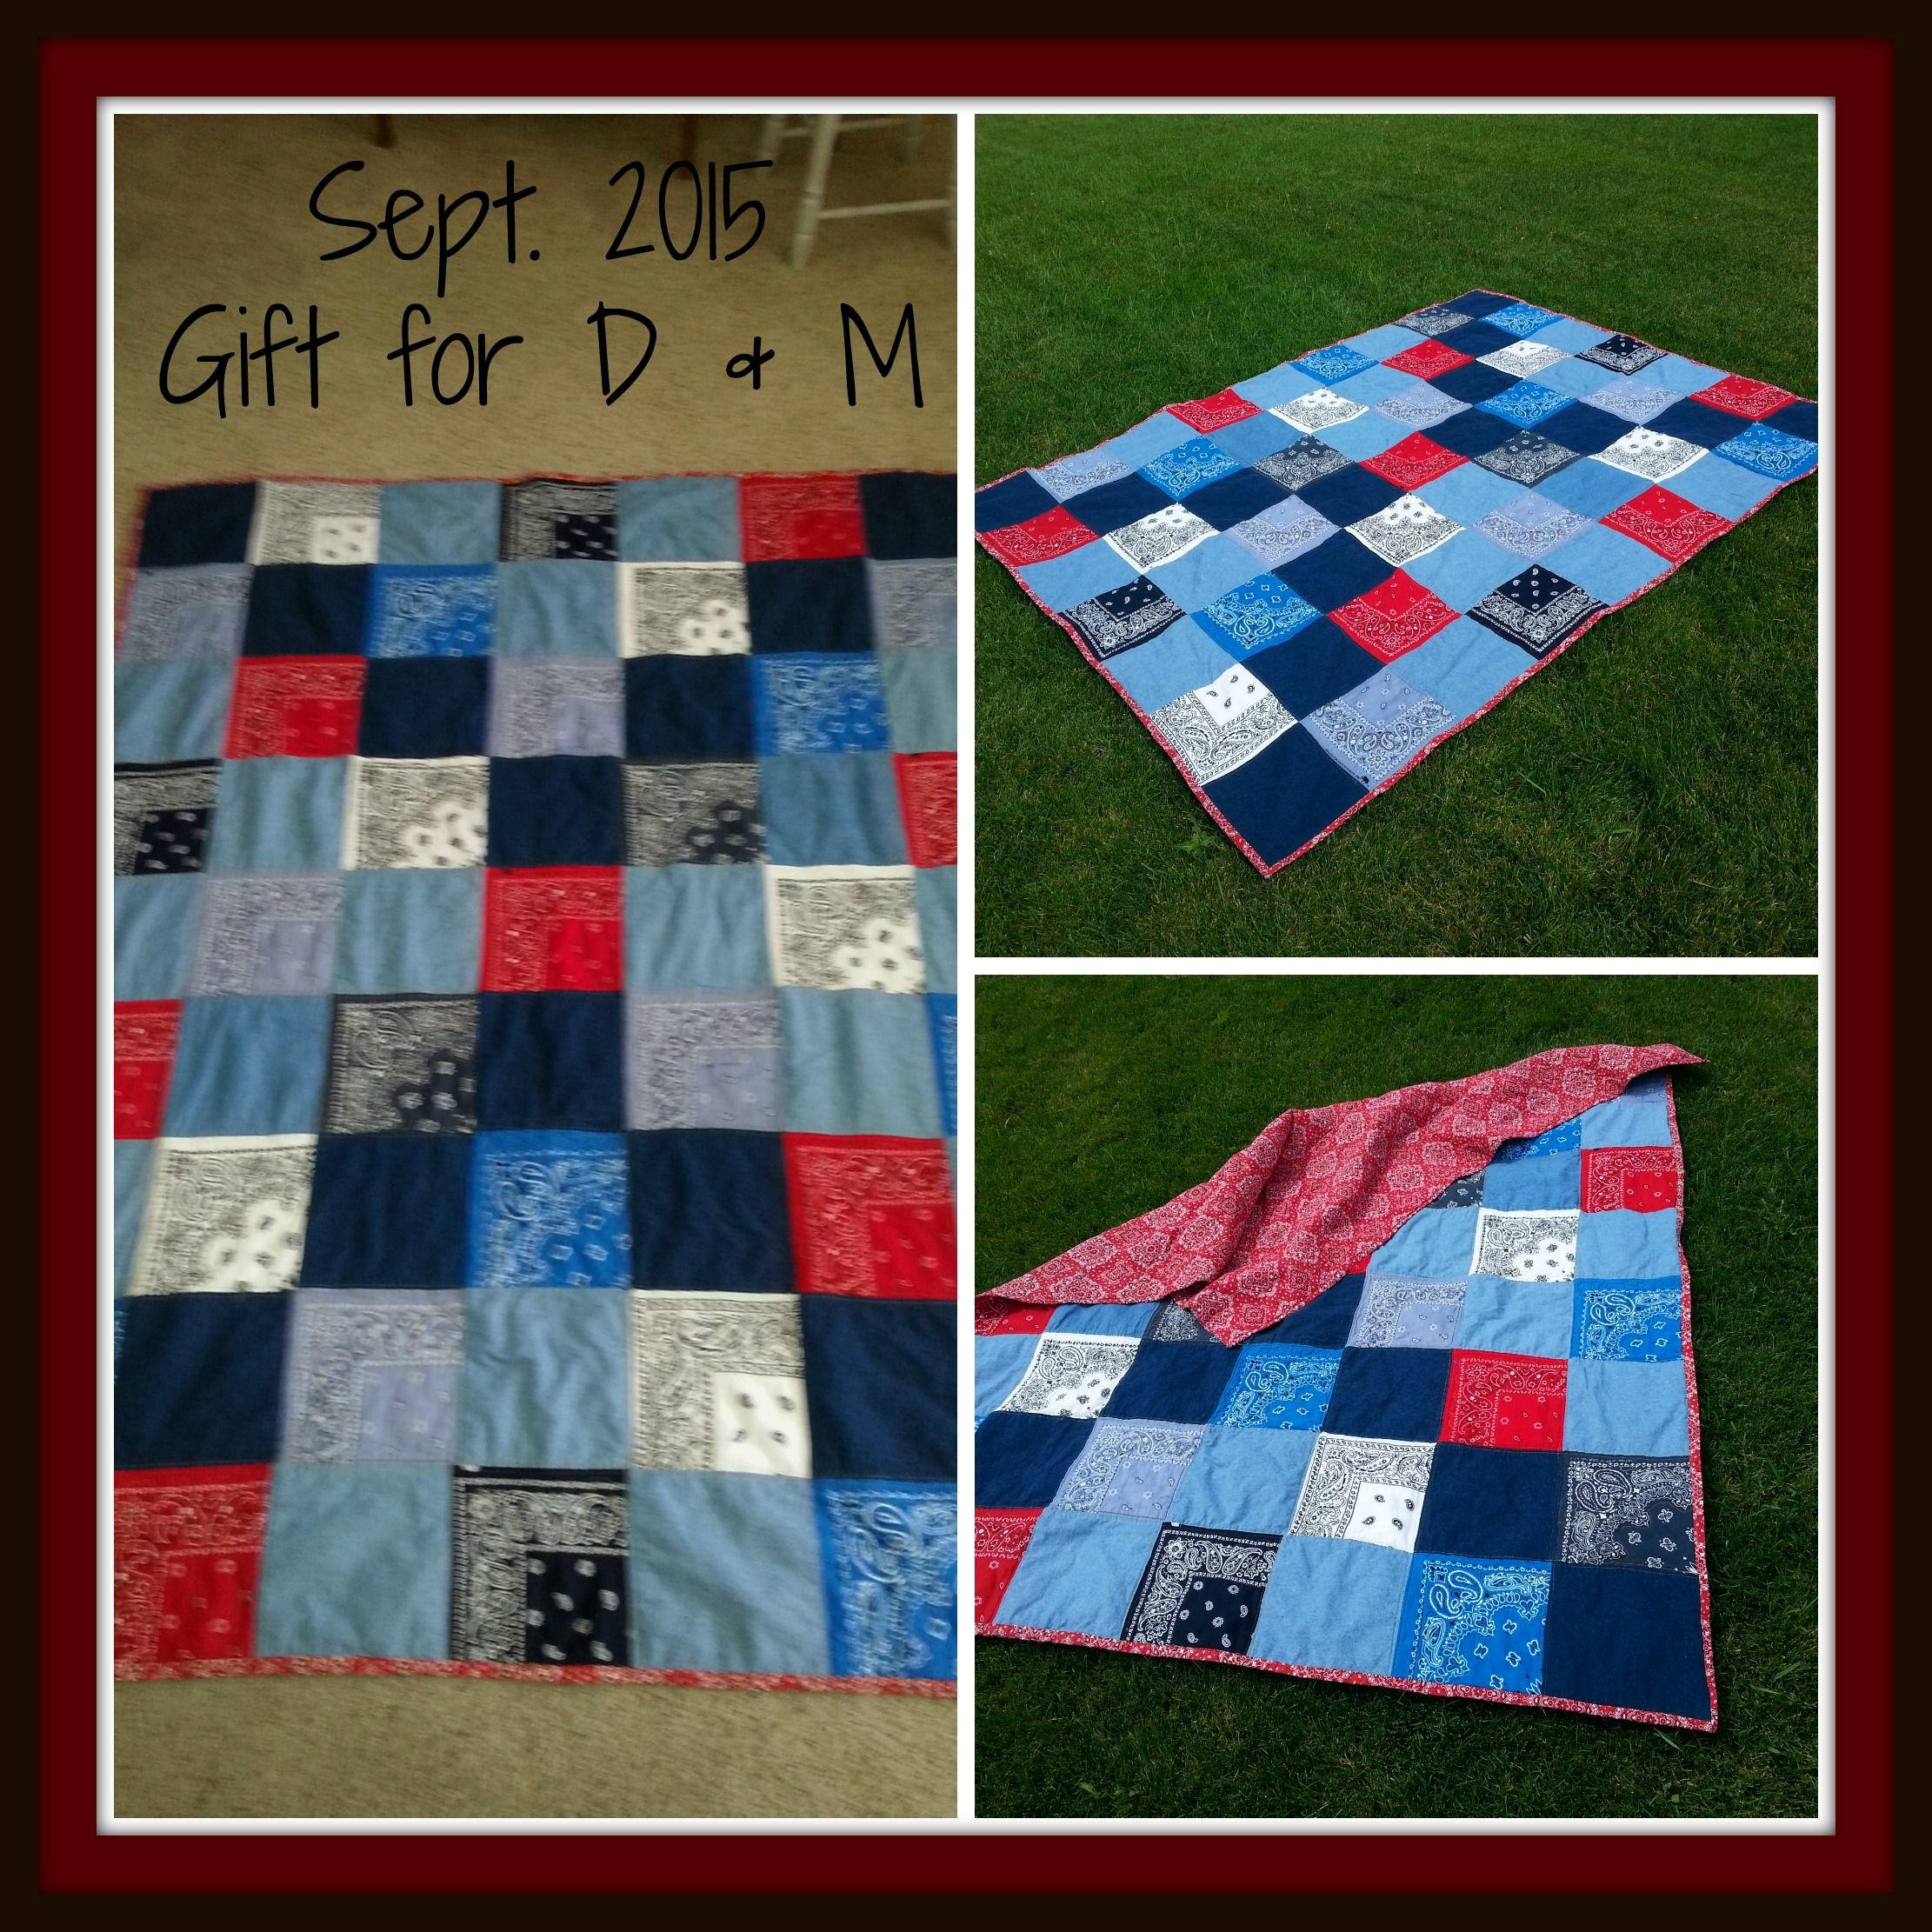 Jean & Bandana picnic blanket